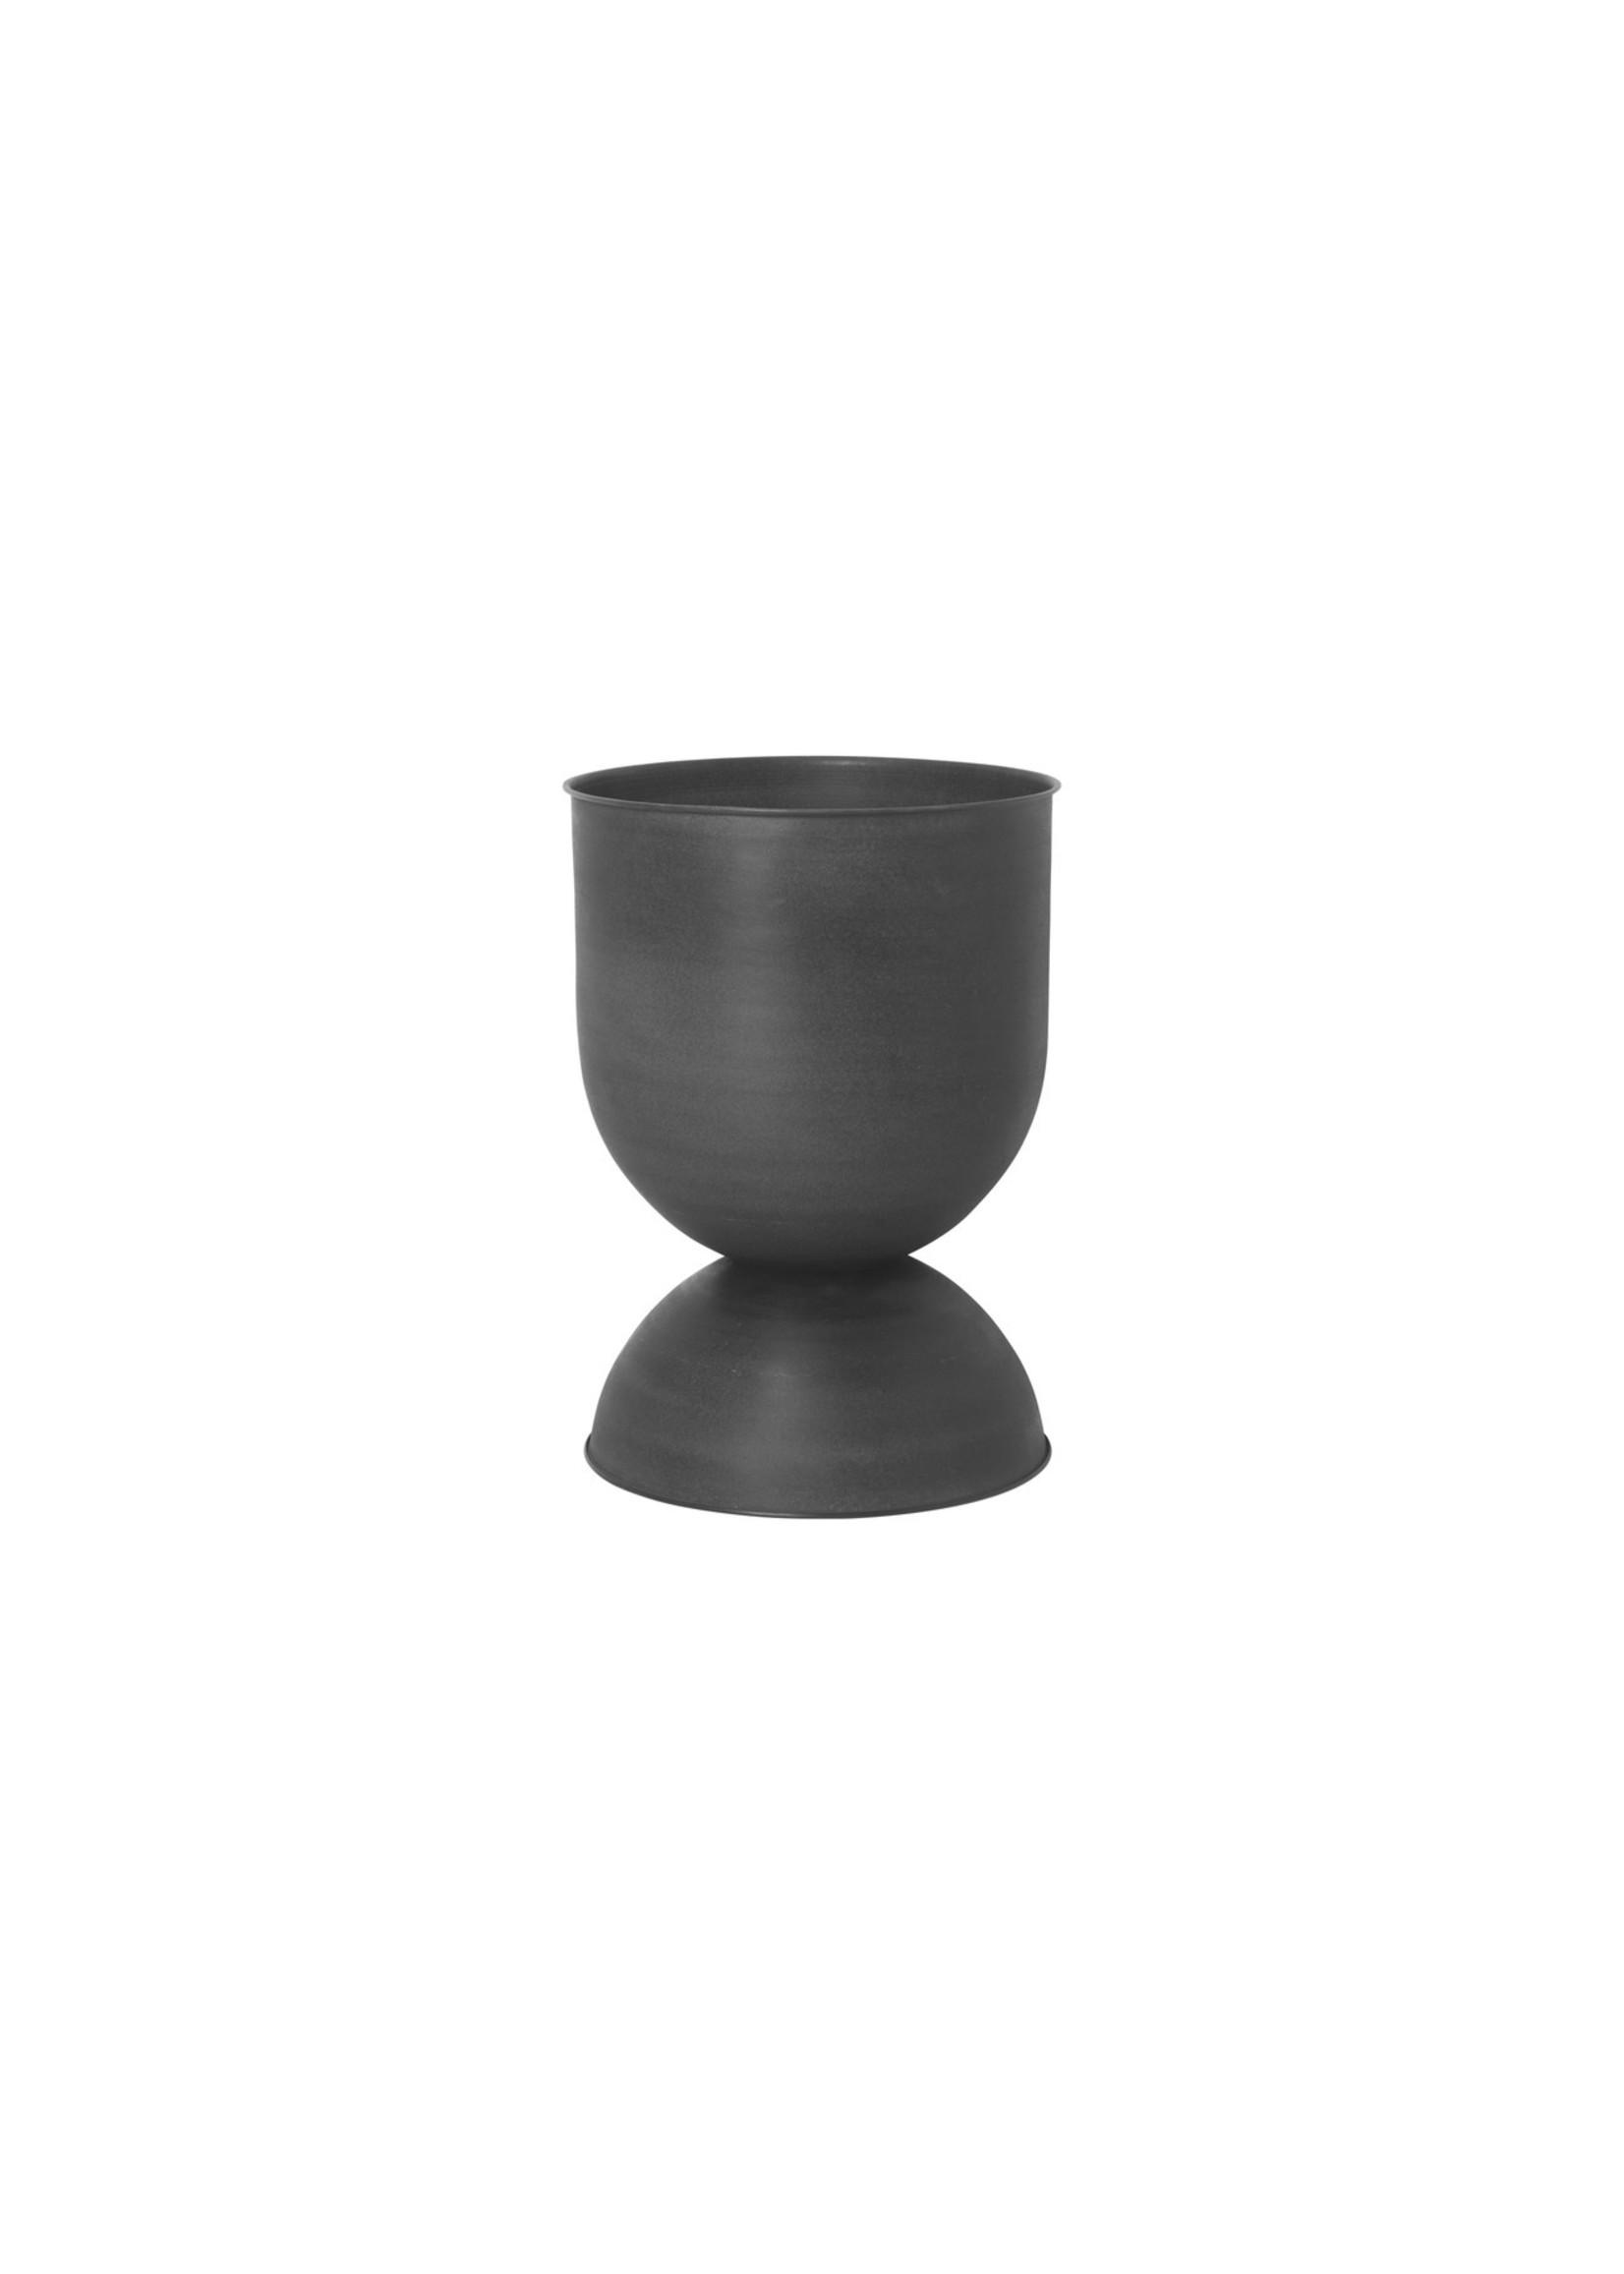 ferm LIVING ferm LIVING Hourglass Plant Pot - Medium